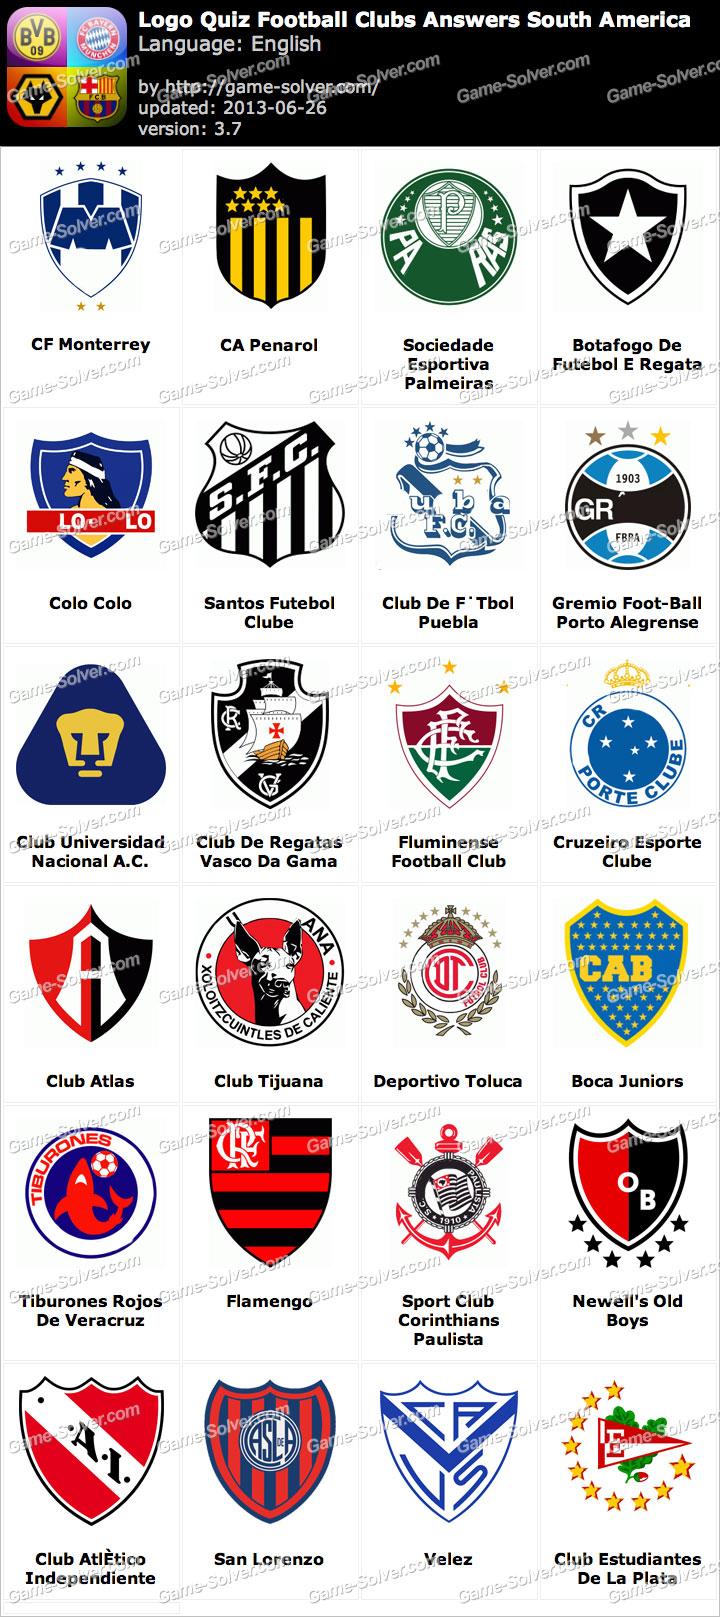 Logo Quiz Football Clubs Answers South America